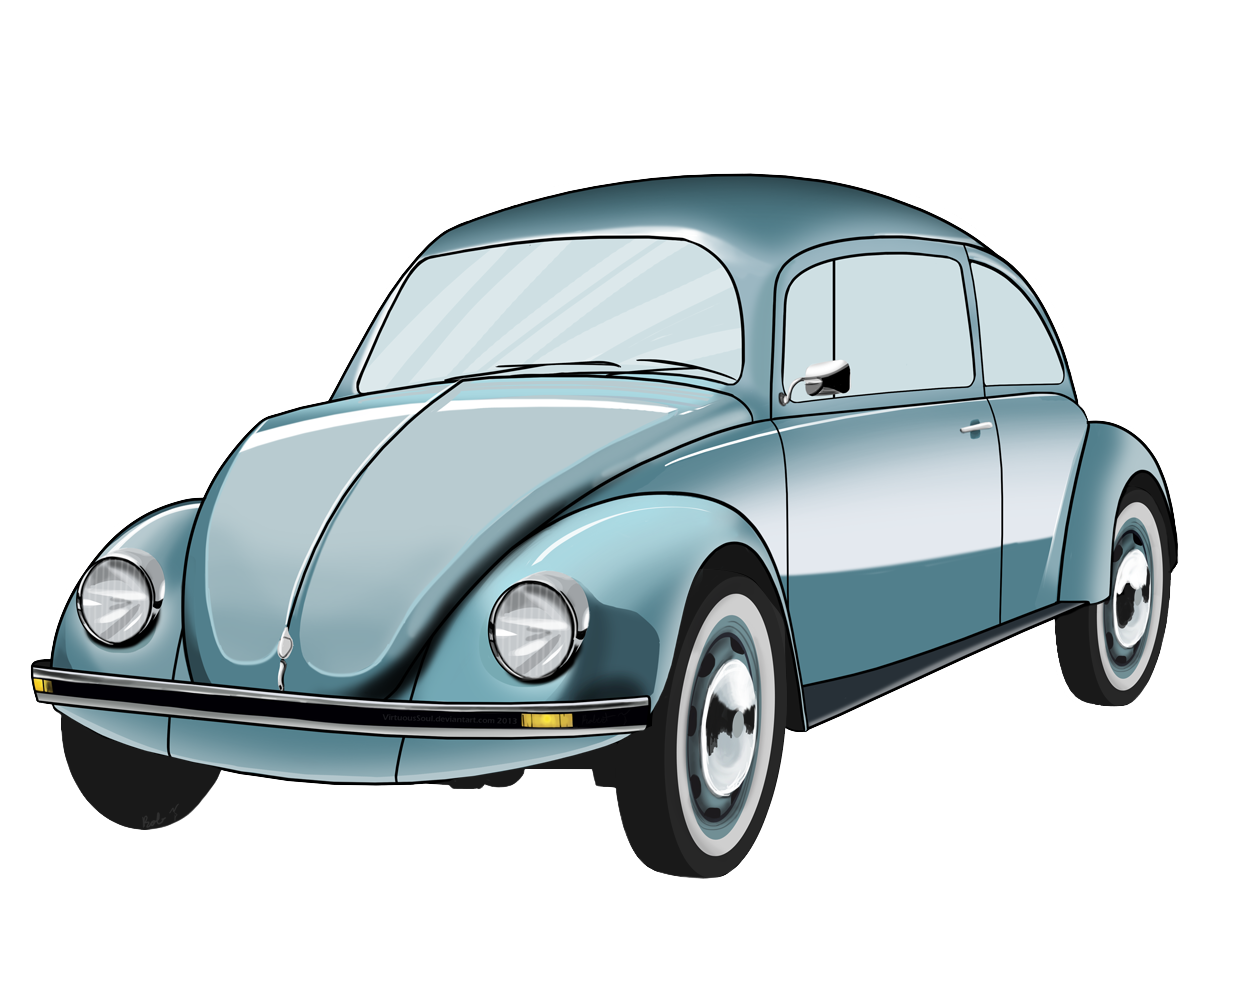 Free Vw Bug Clipart, Download Free Clip Art, Free Clip Art.